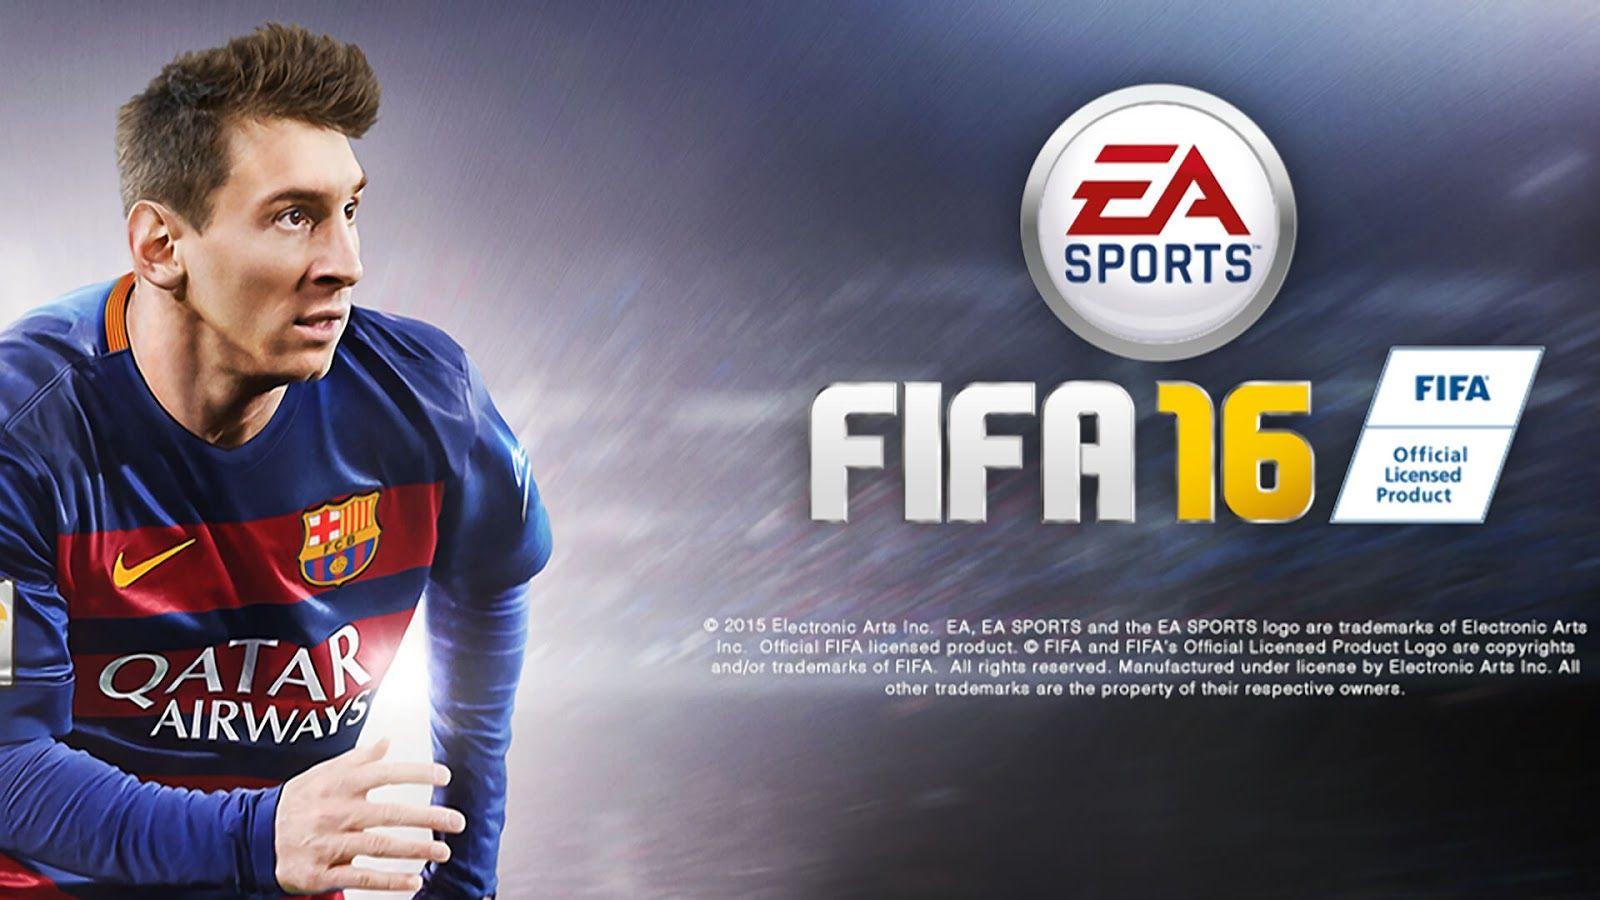 Fifa 16 Pc Game Free Download Fifa 16, Fifa, Fifa